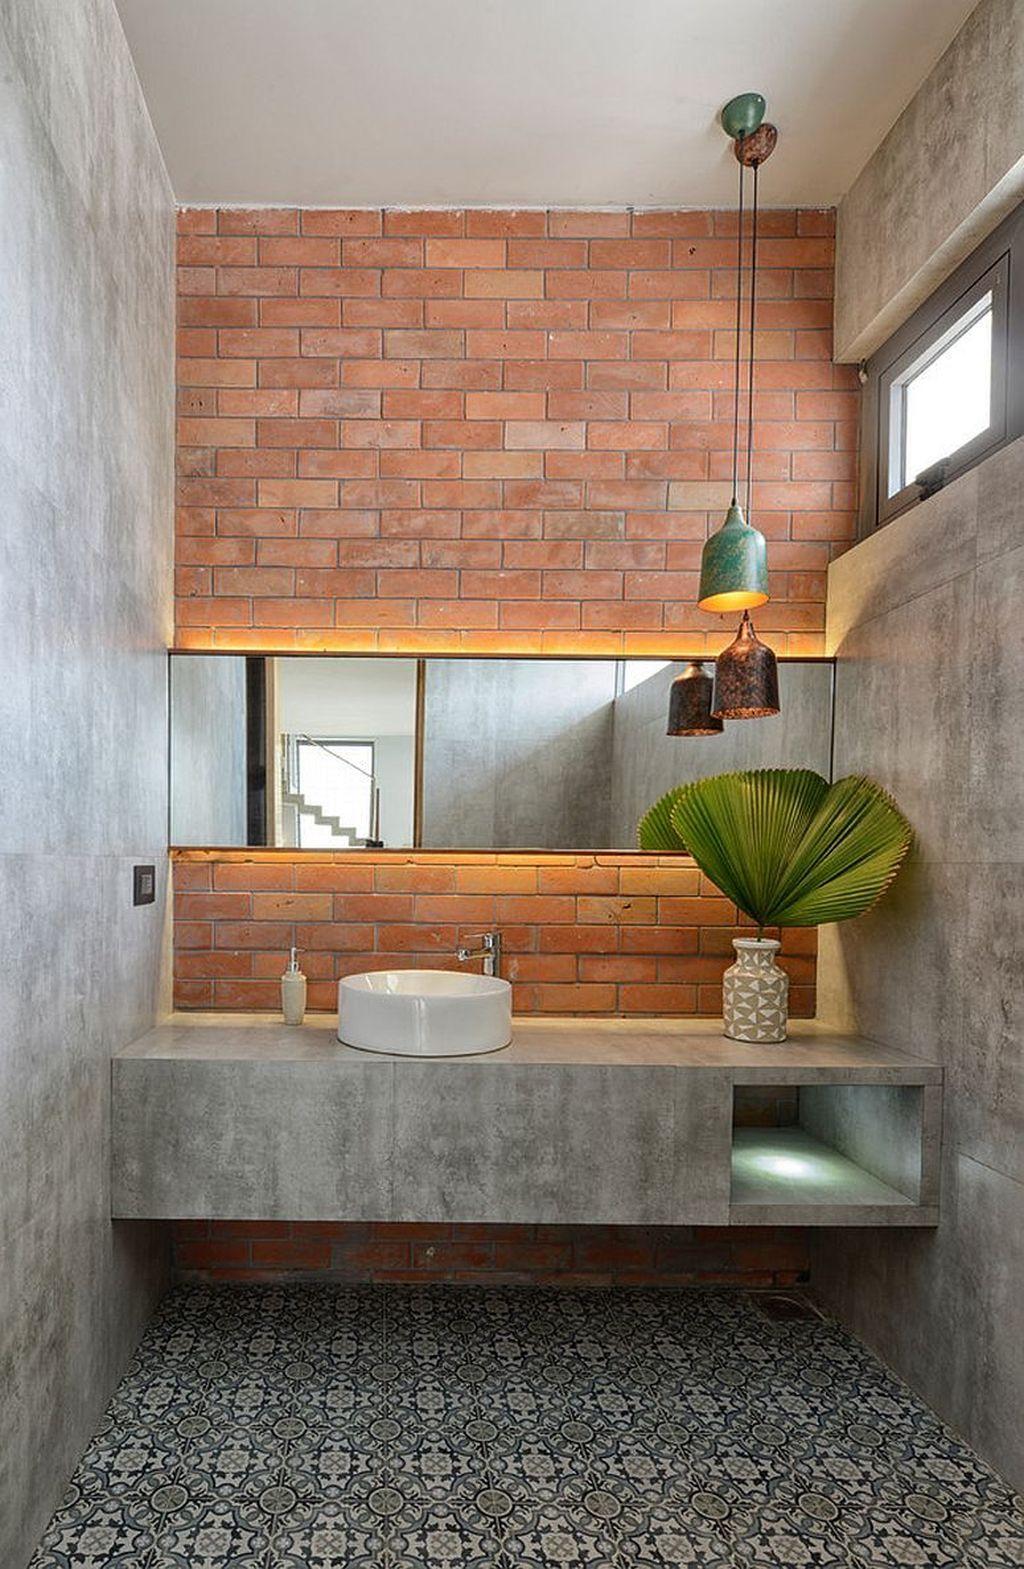 Unusual Bathroom Design Ideas You Need To Know 31